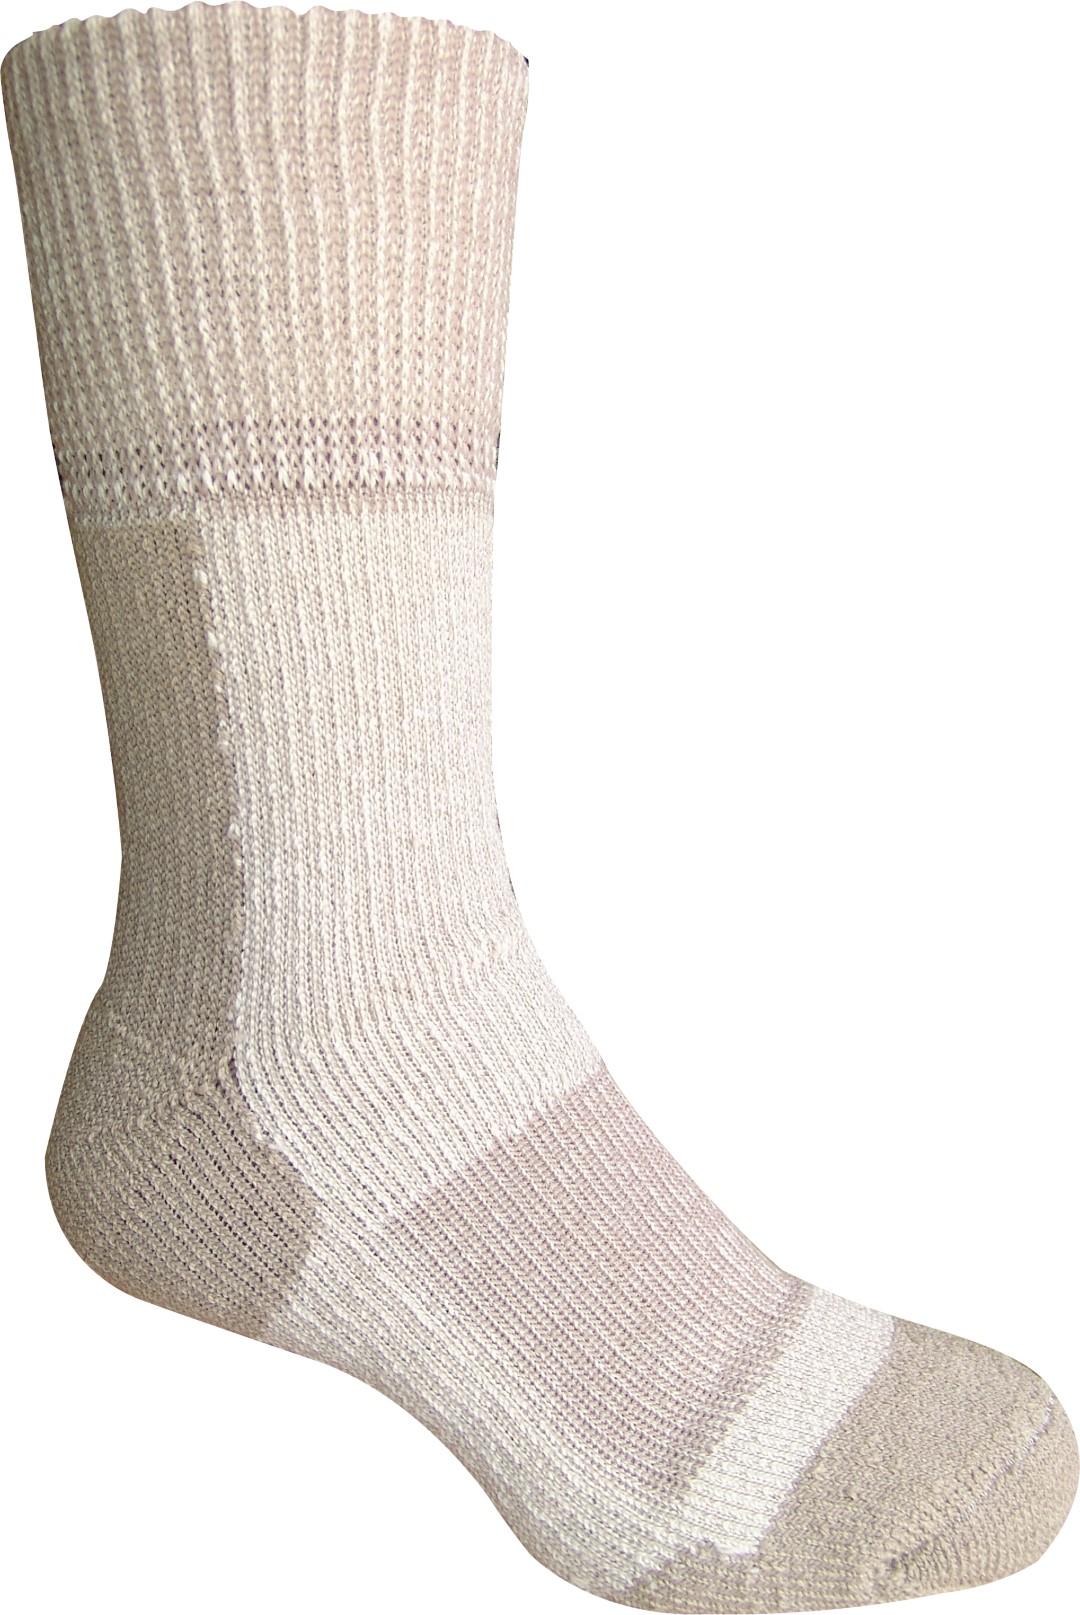 Image of Skellerup Earthtec Ultimate Sock